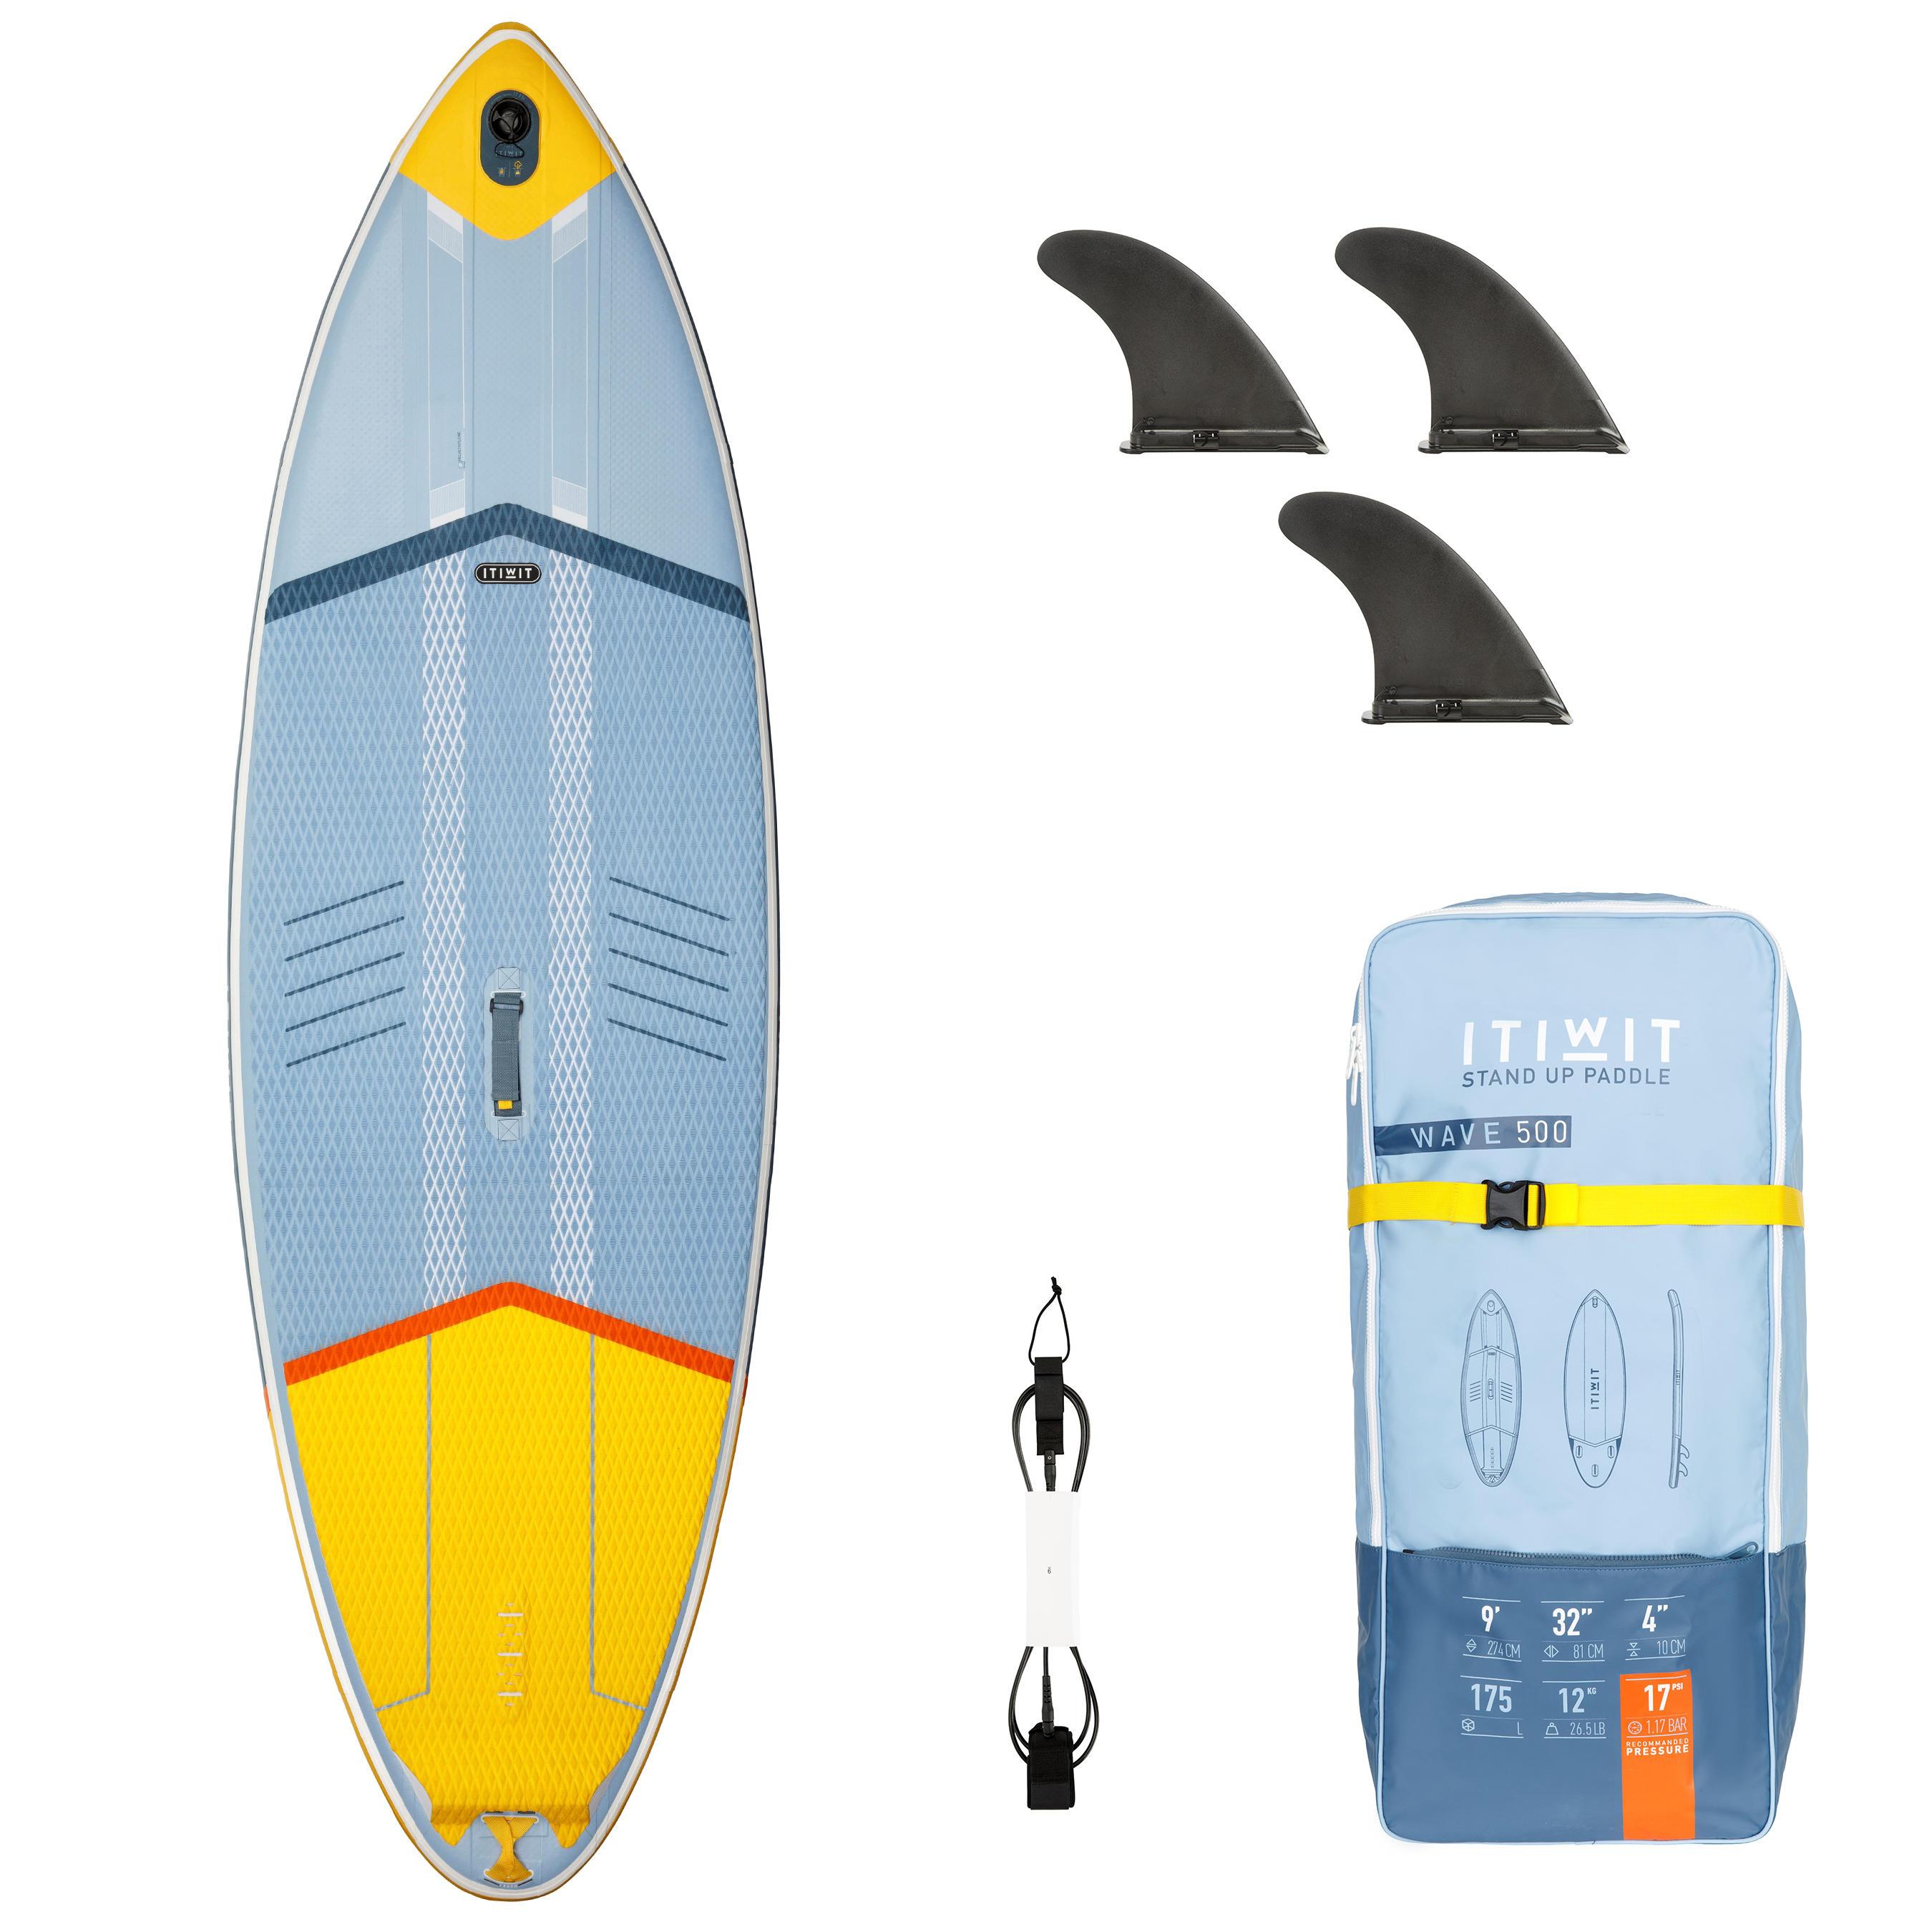 Itiwit Opblaasbaar wave supboard 500 - 9' geel 175 l